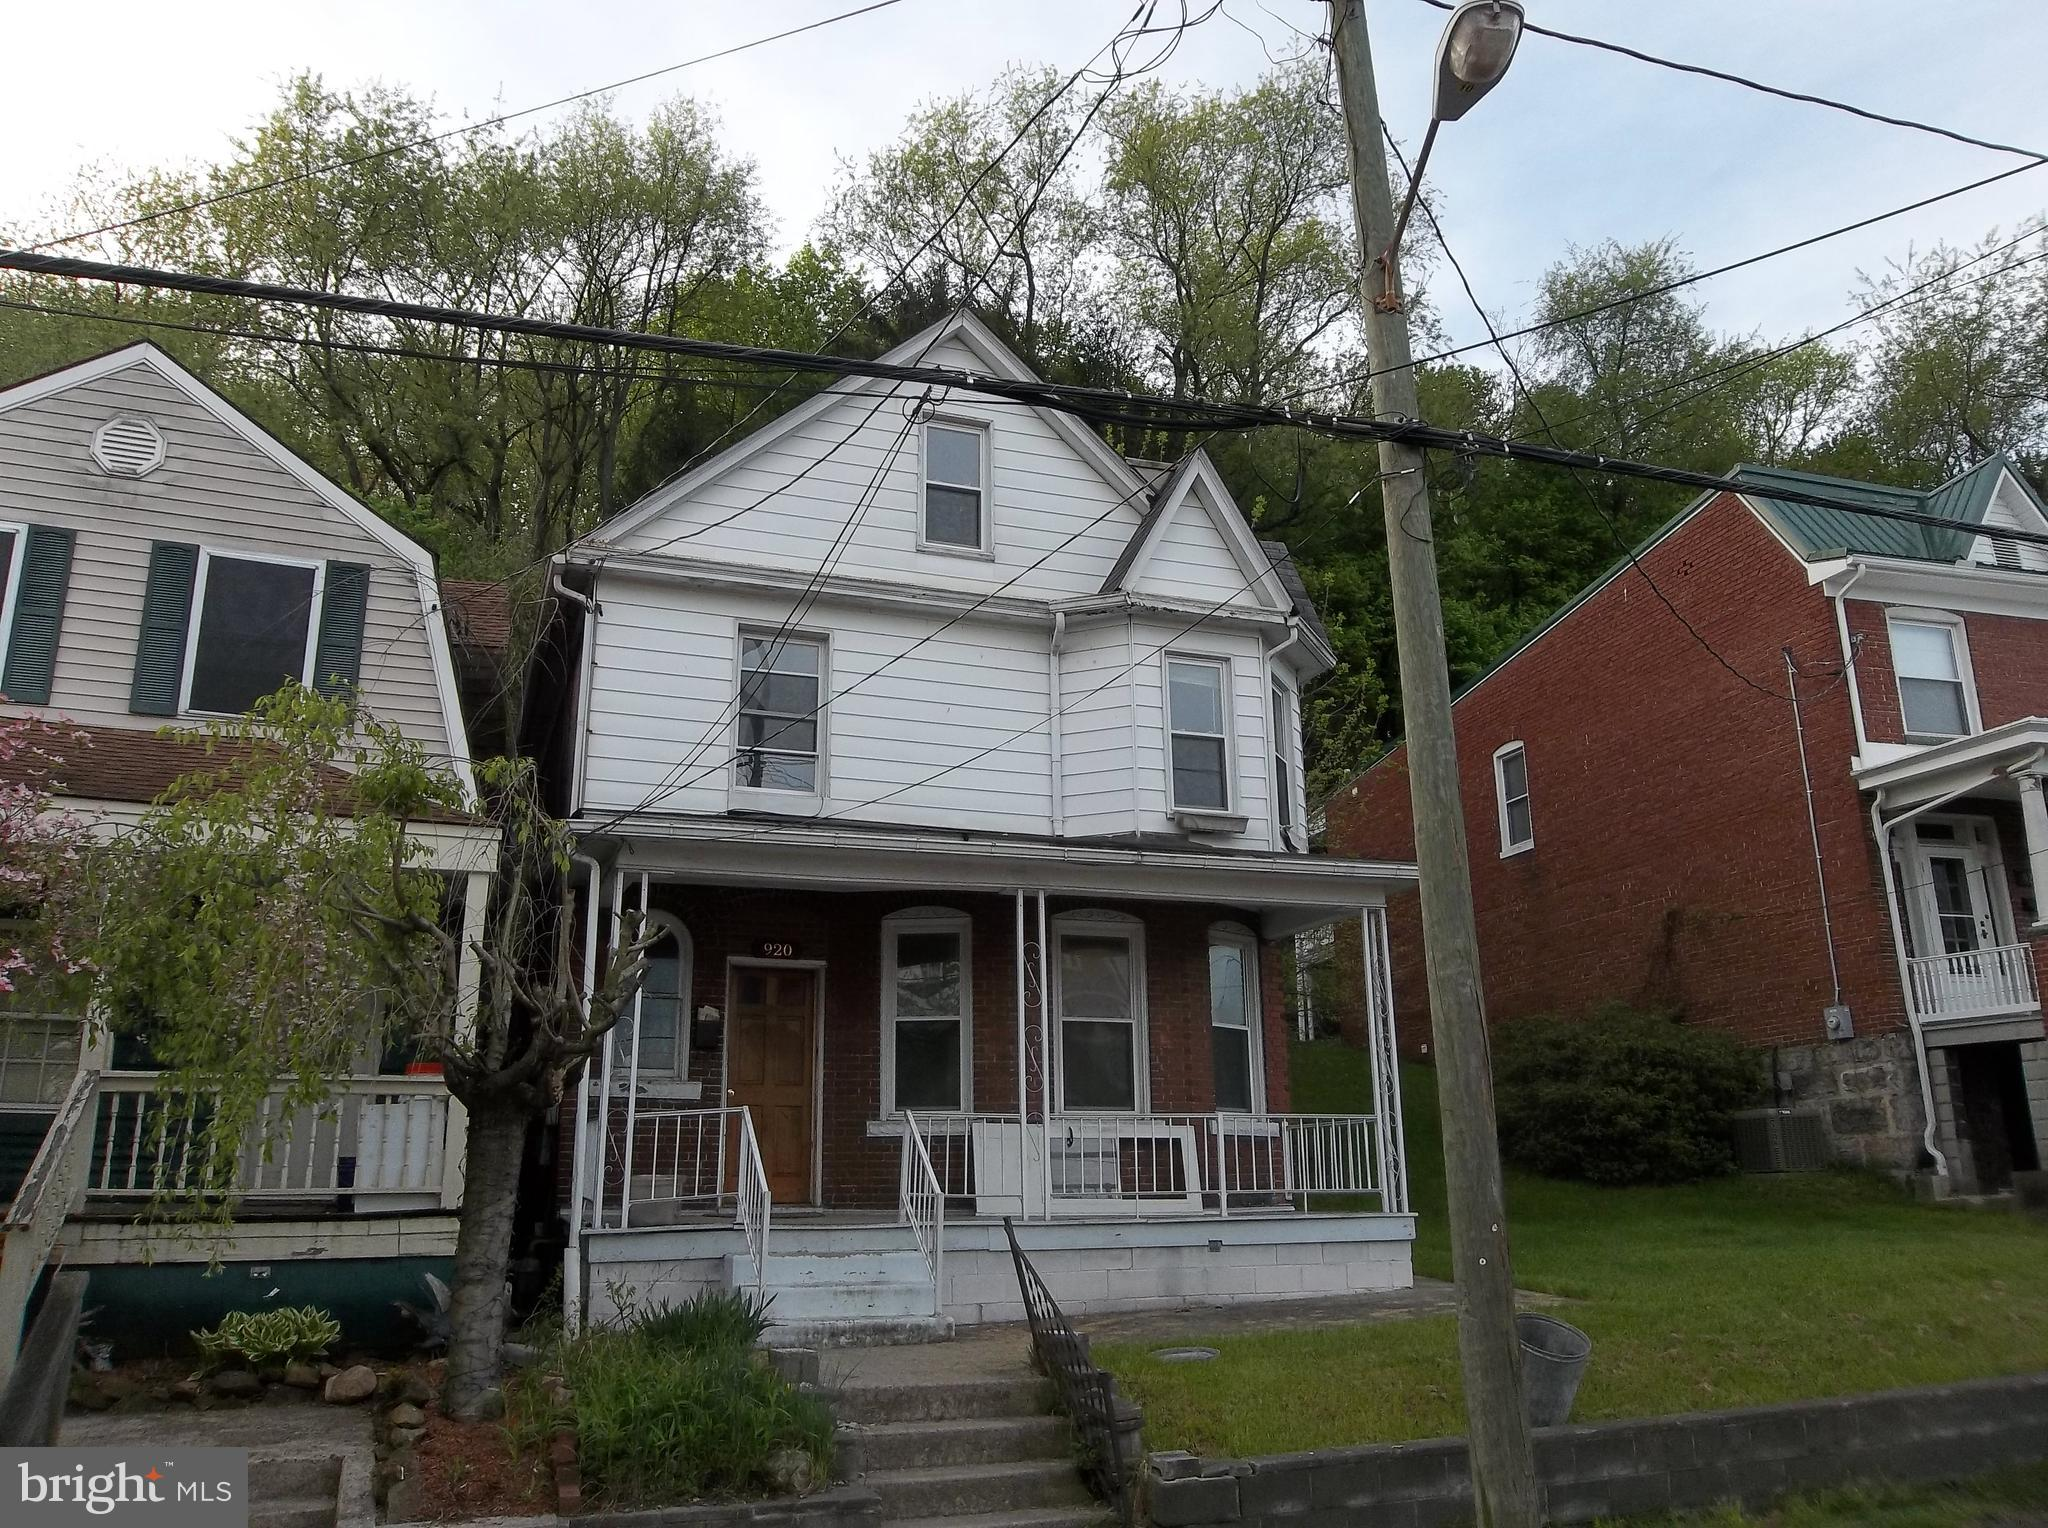 920 Maryland Ave, Cumberland, MD, 21502